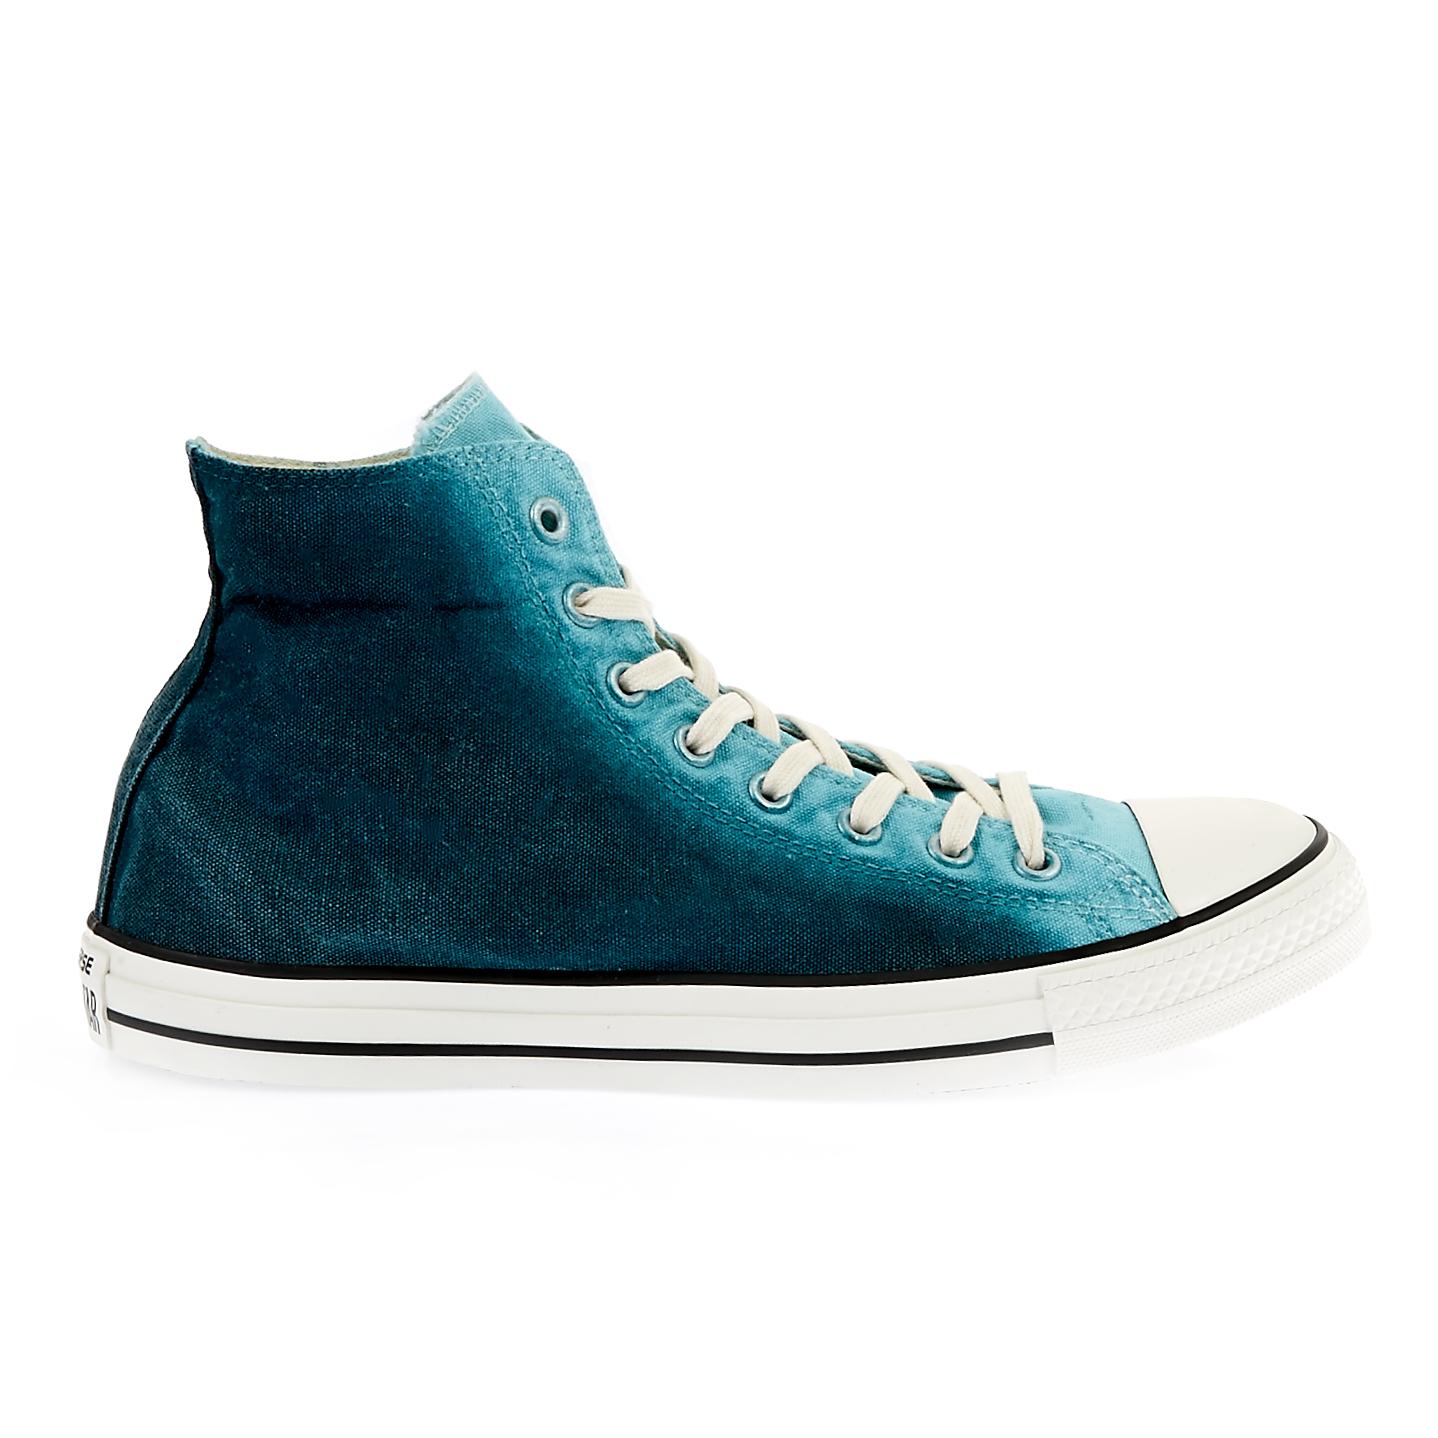 CONVERSE - Unisex παπούτσια Chuck Taylor All Star Hi μπλε-πράσινα